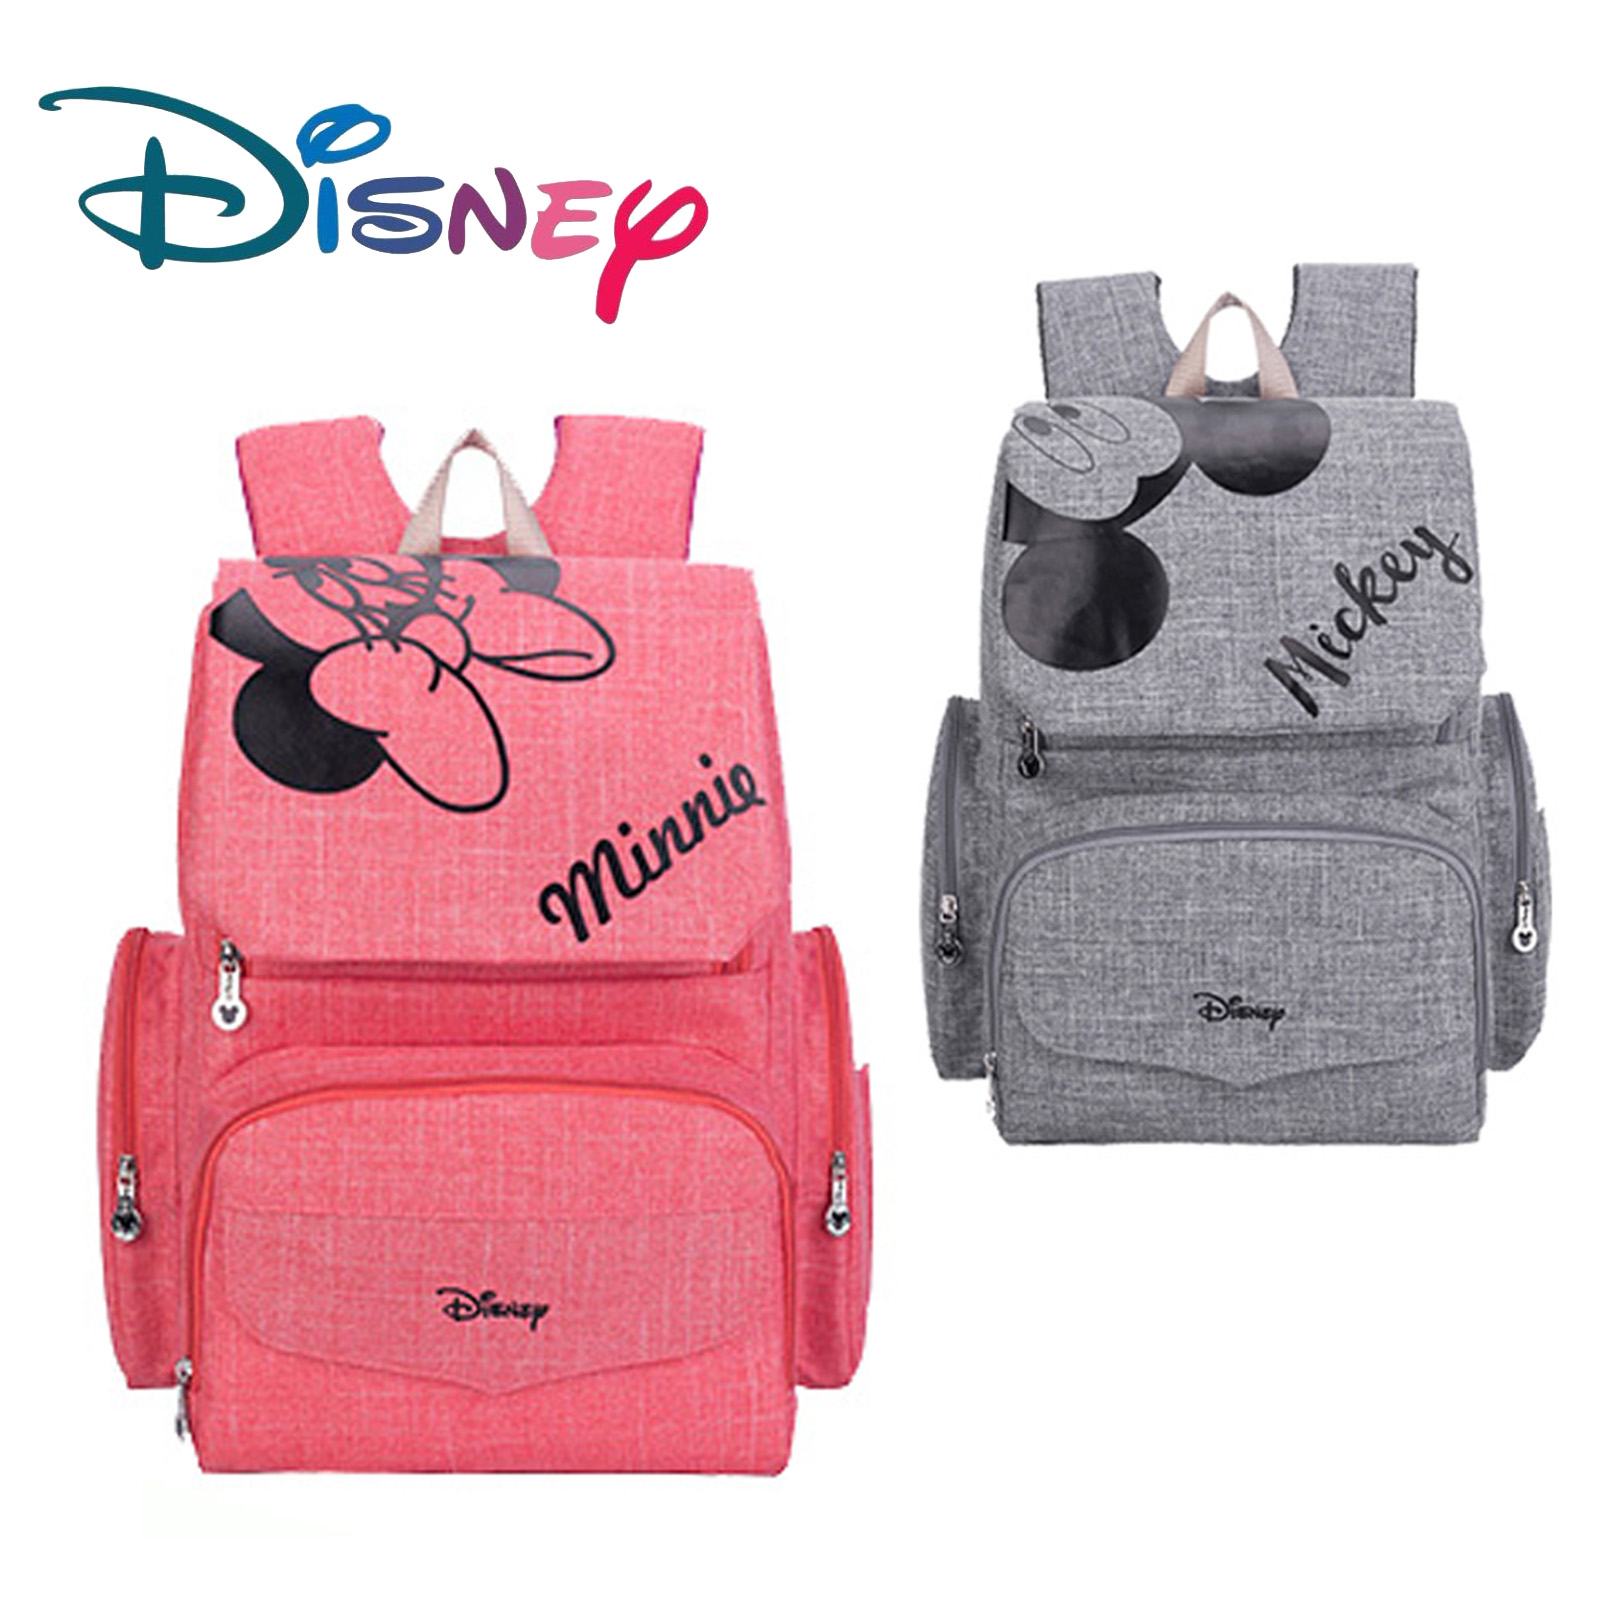 Disney Fashion Mummy Maternity Nappy Bag Baby Diaper Bagsbolsa Maternidade Para Bebe Waterproof Bag For Stroller Large Capacity